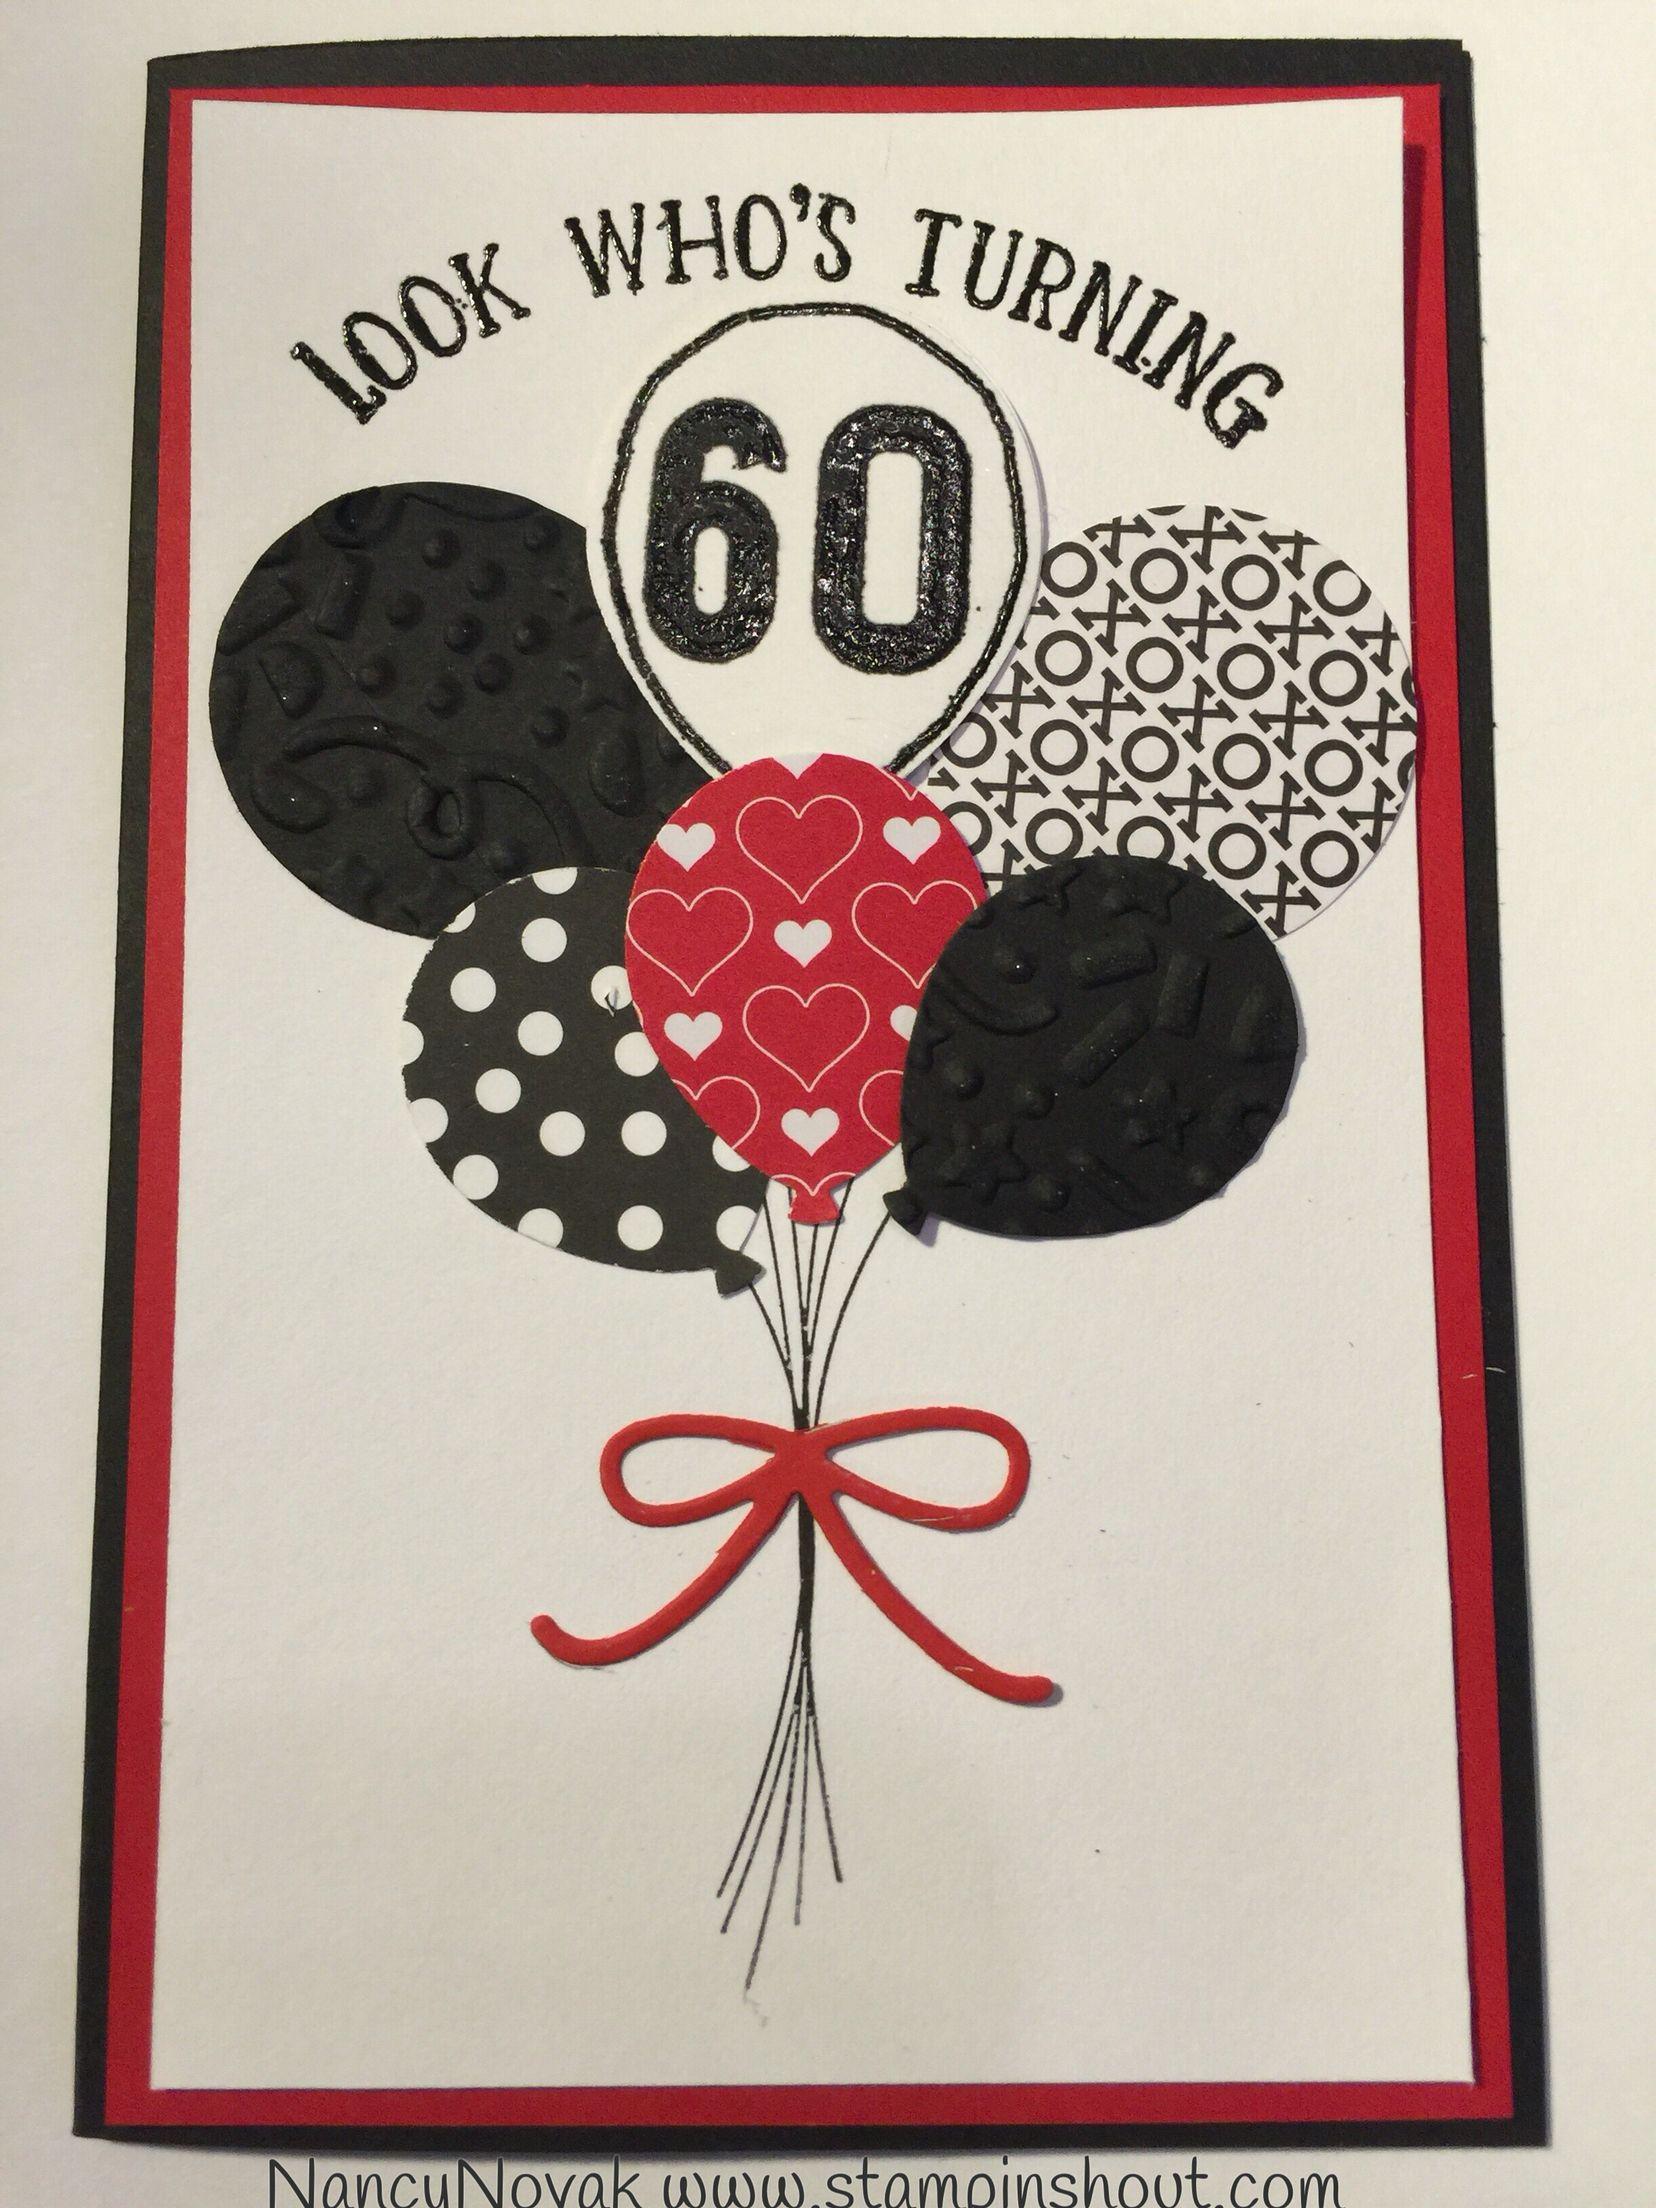 Stampin Up Balloon Card 60th Balloon Birthday Card Stampinshout Balloon Celebration 60th Birthday Cards 21st Birthday Cards Birthday Cards